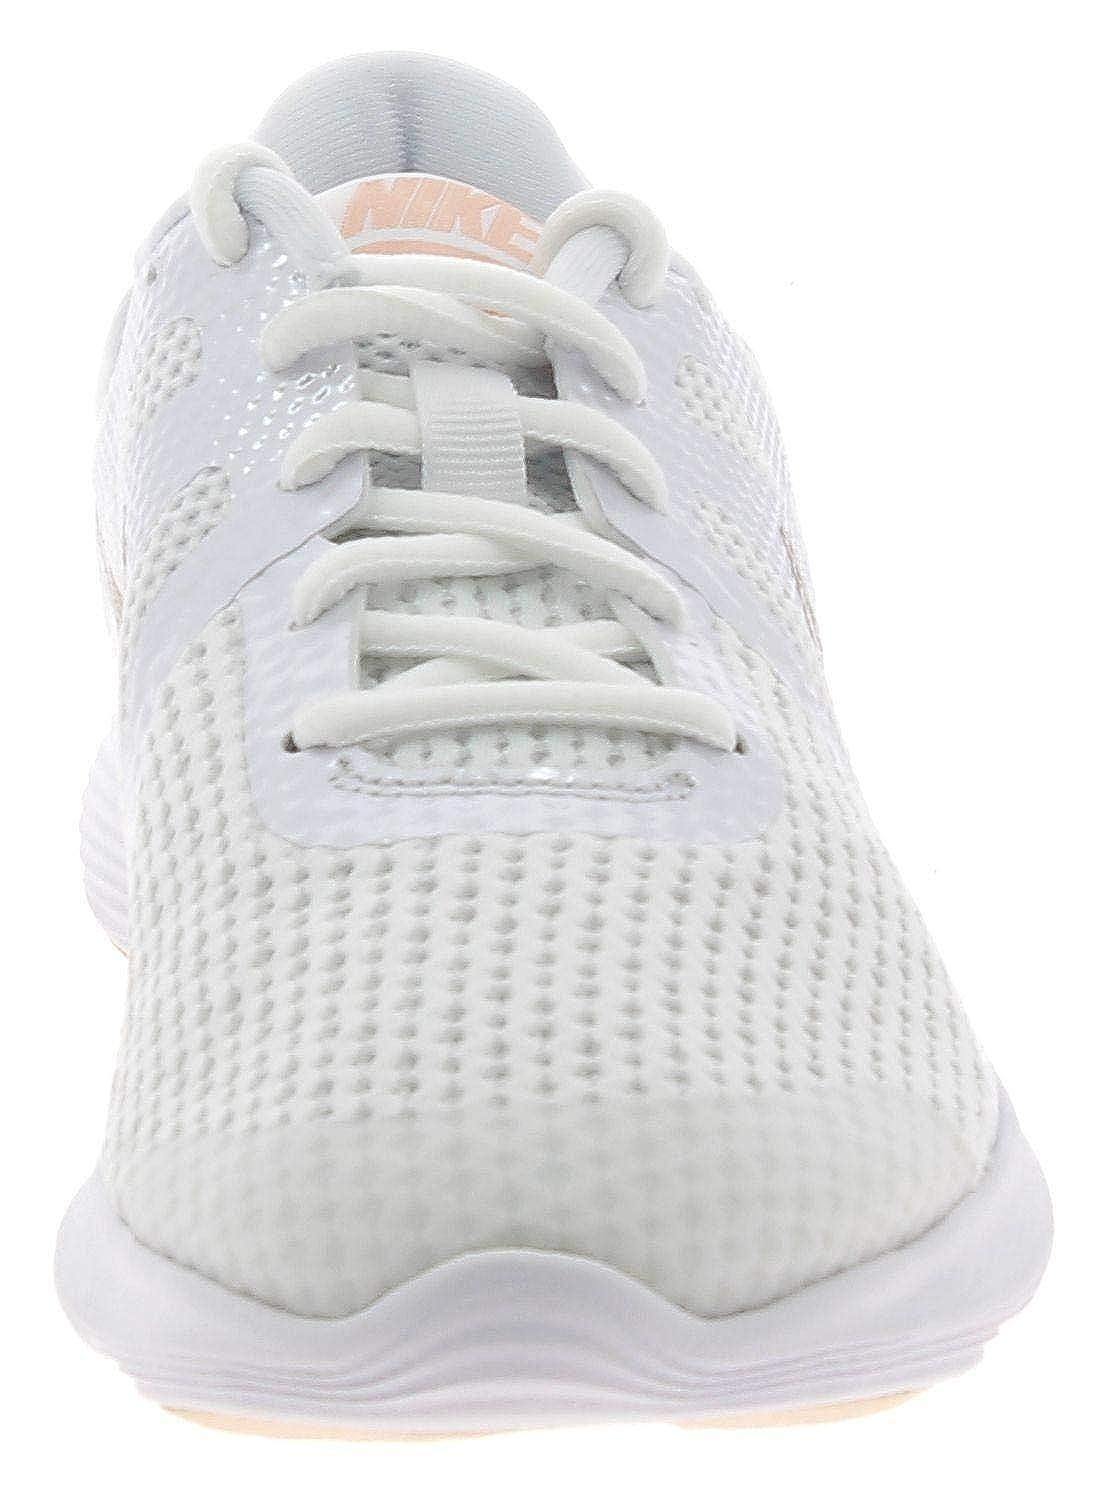 Nike Revolution 4 GS Damen-Sportschuhe Weiß 943306100 39 EU EU EU c1ffc7